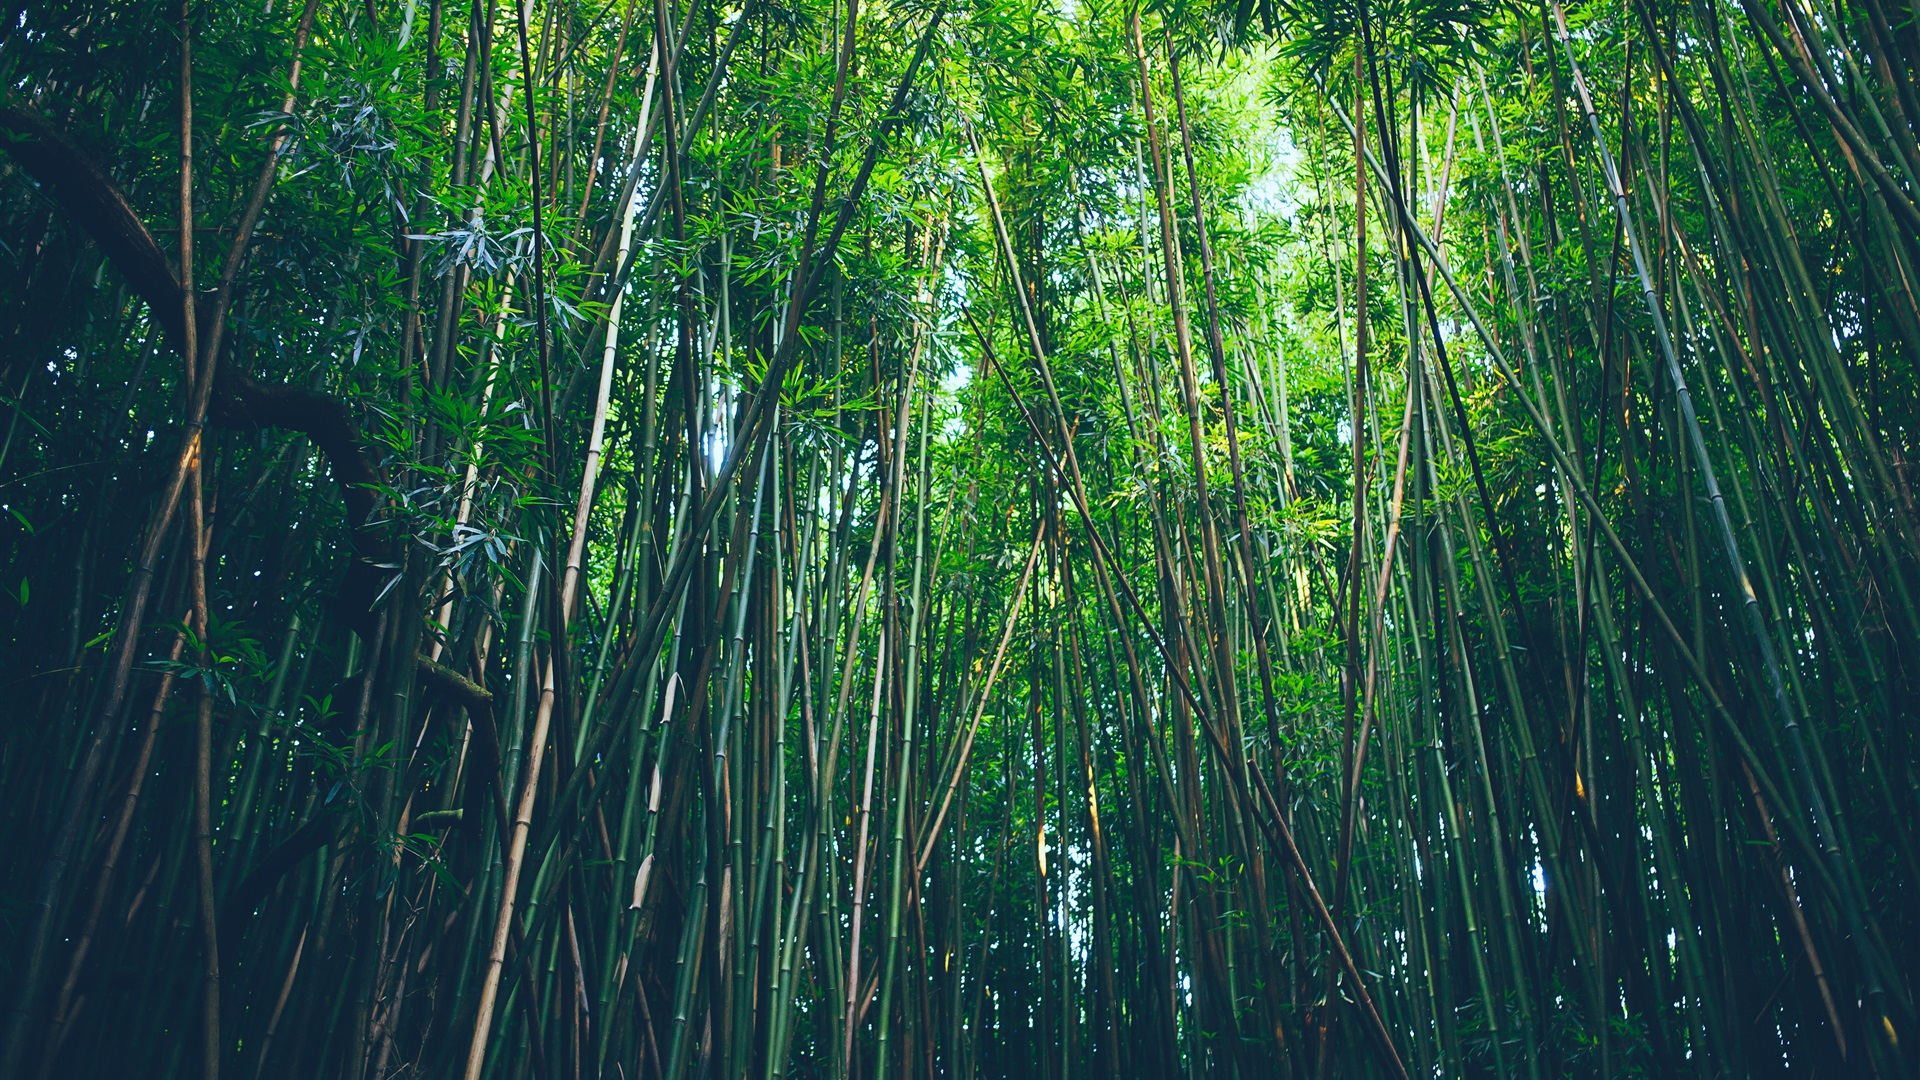 bamboo forest wallpaper hd